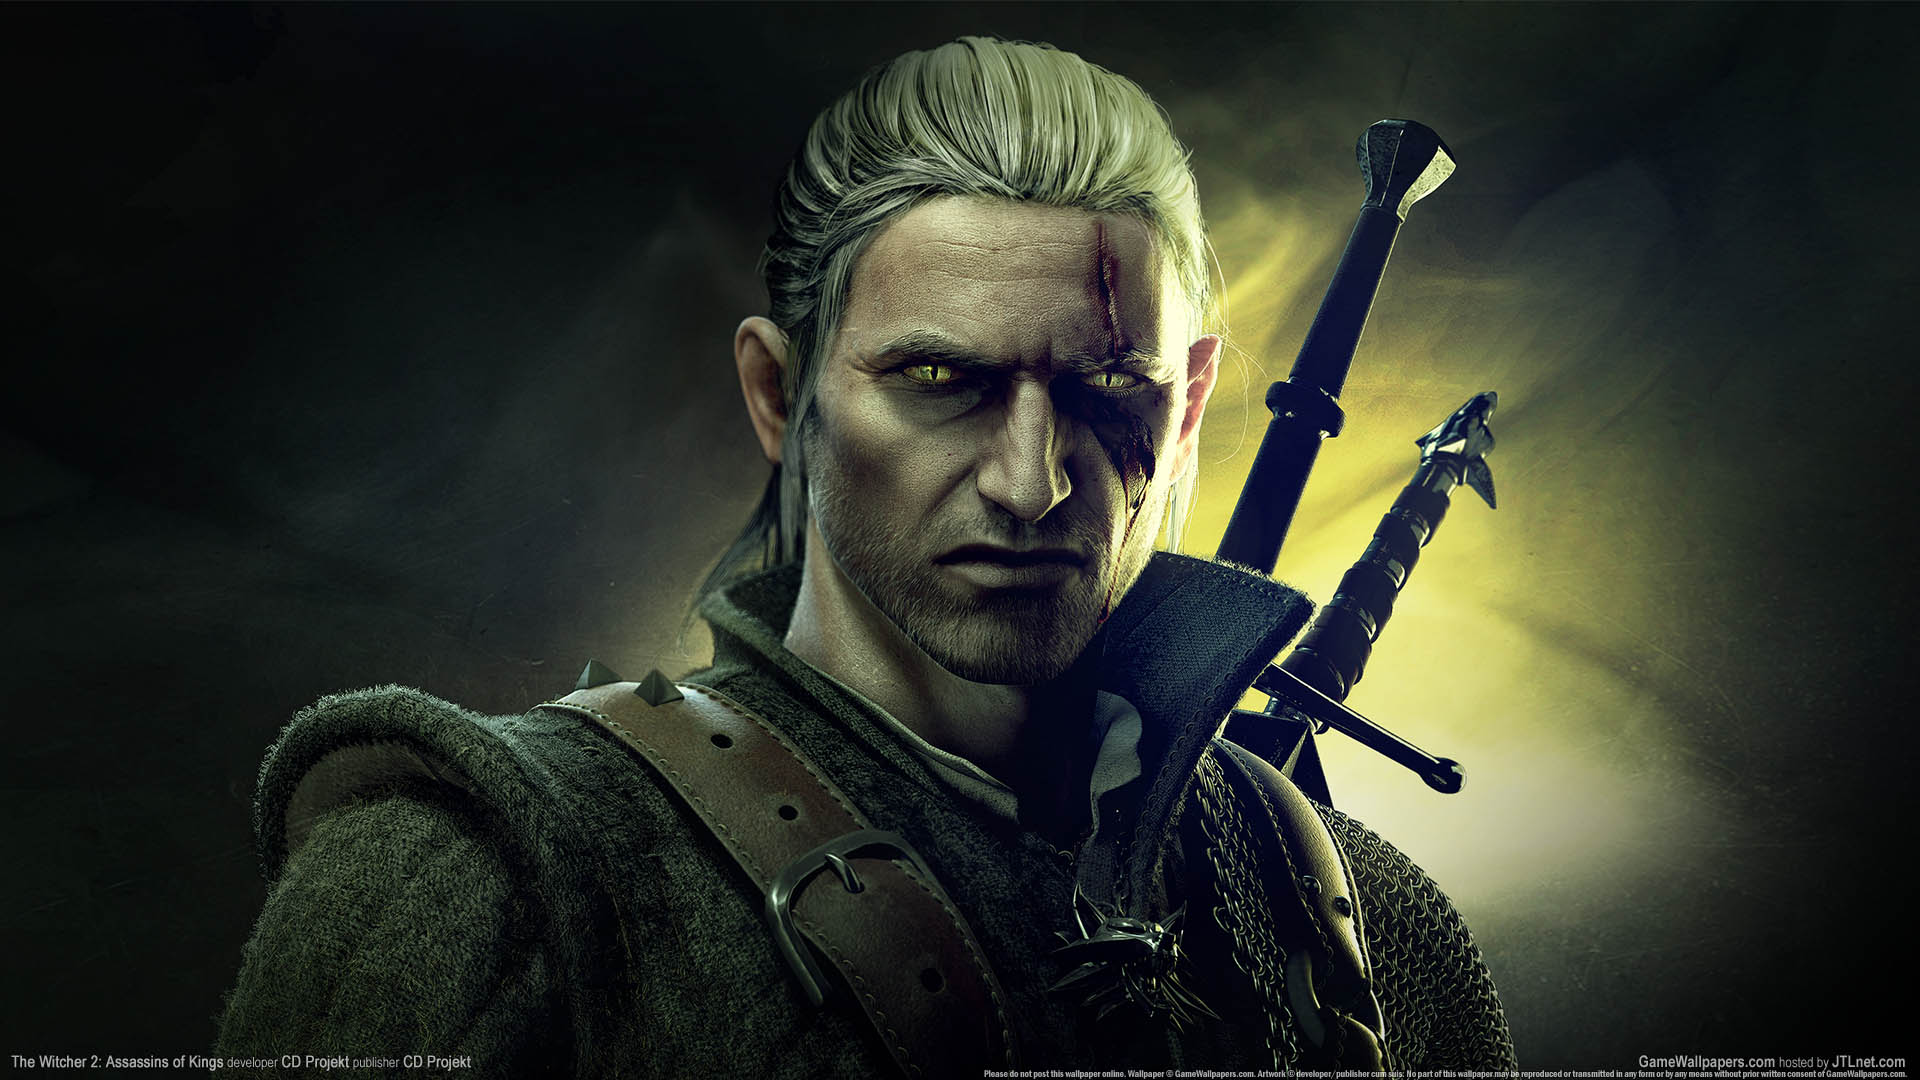 The Witcher 2: Assassins of Kings Hintergrundbild 01 1920x1080